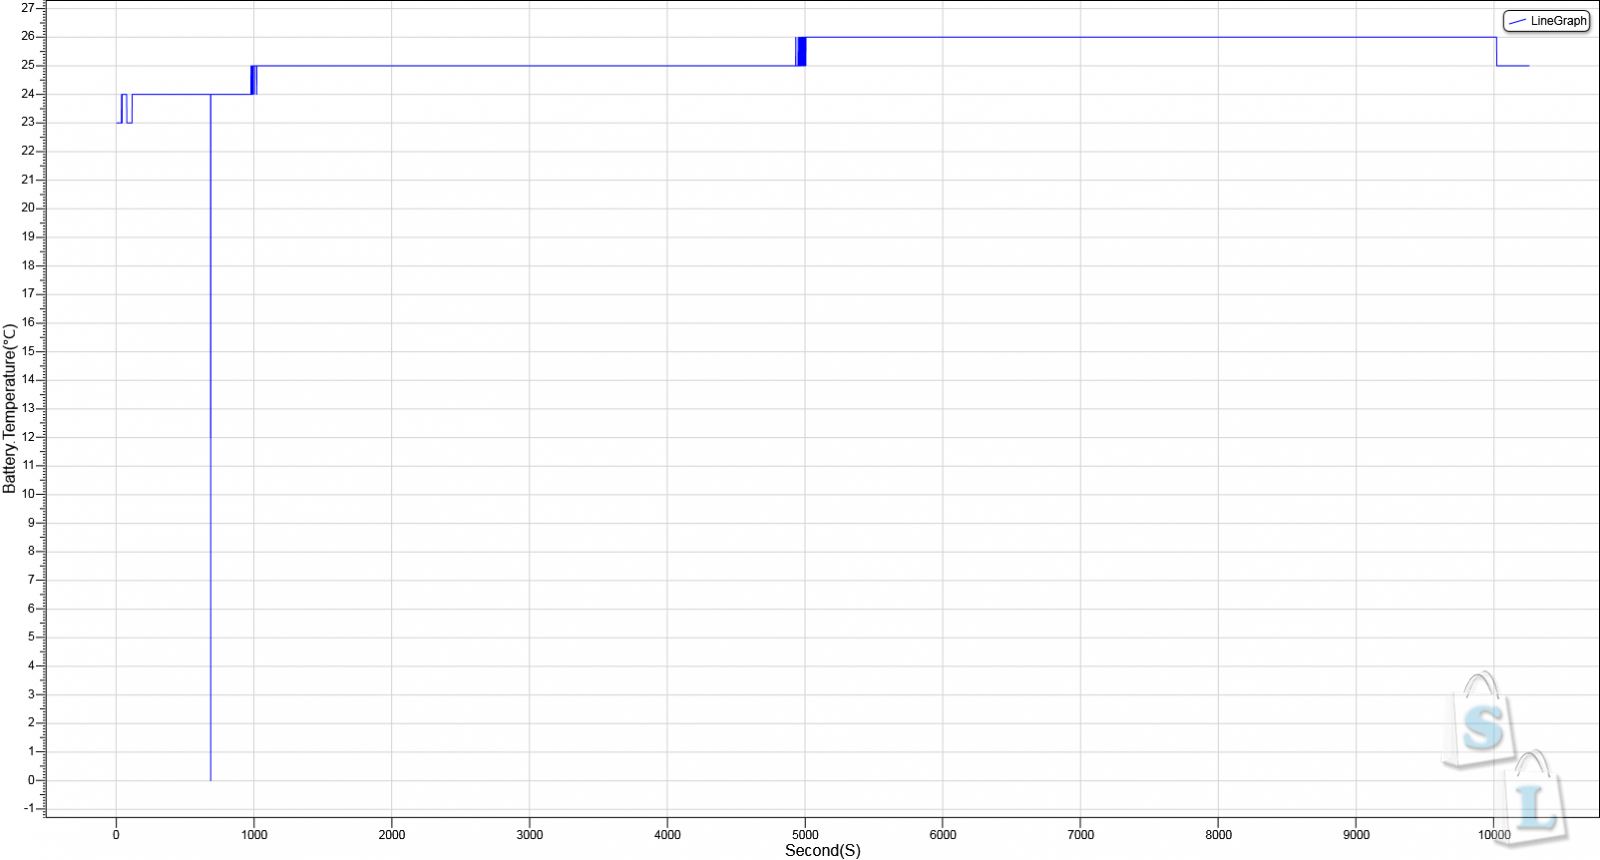 GearBest: Обзор и тестирование Li - ion аккумуляторов ICR 18650 - 26FM 3.7V 18650 2600mAh